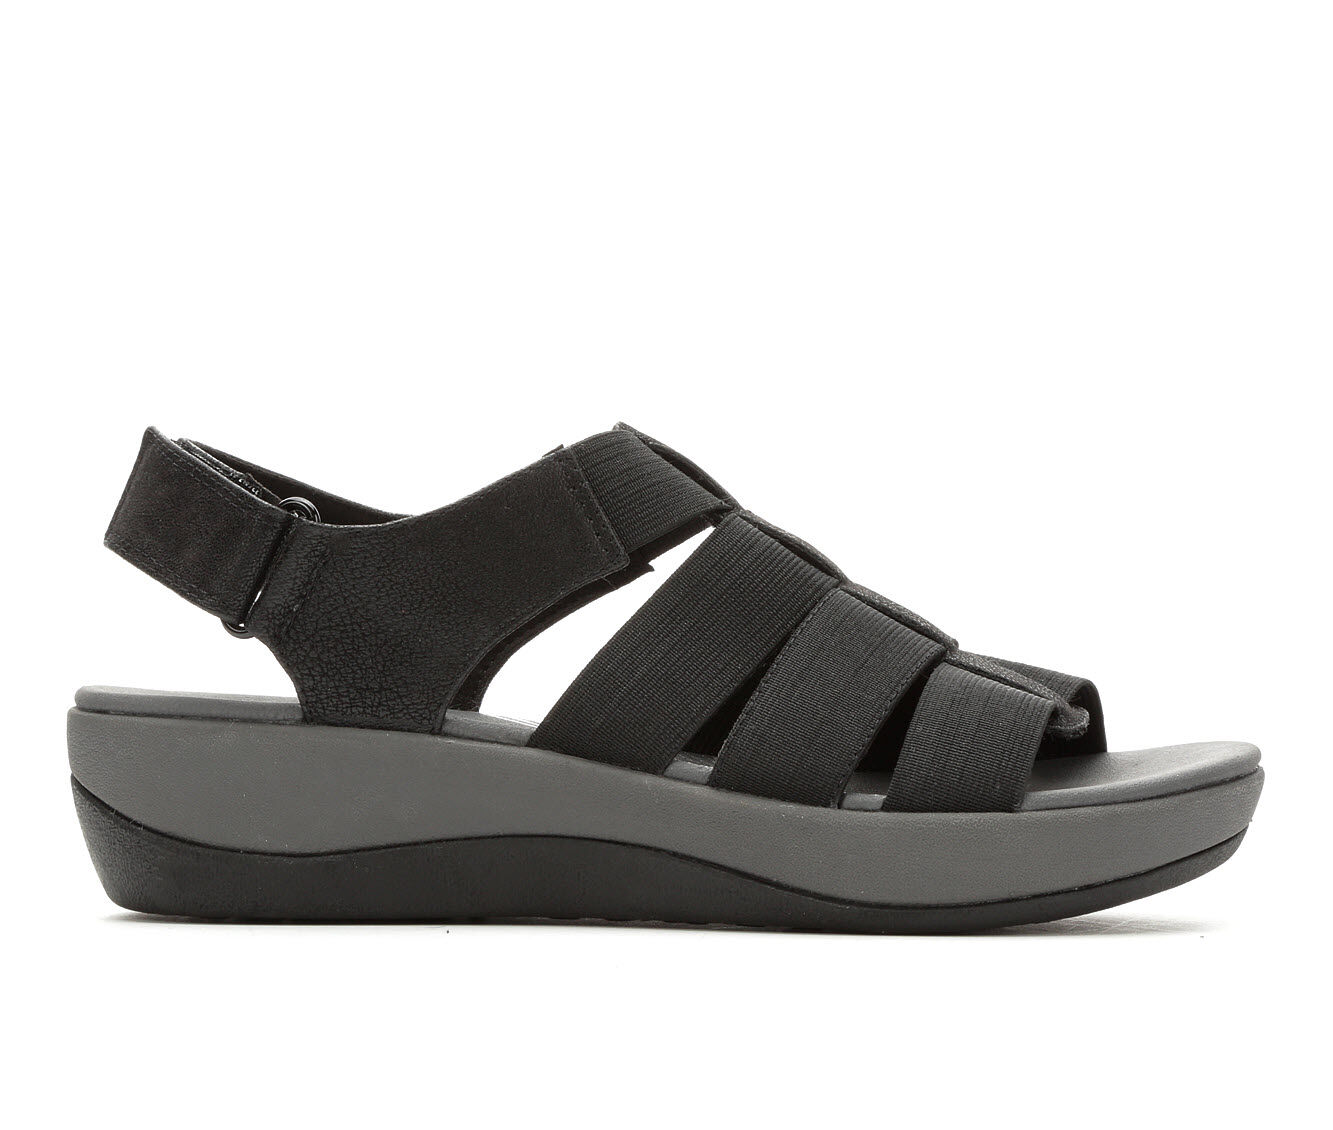 Women's Clarks Arla Shaylie Sandals Black